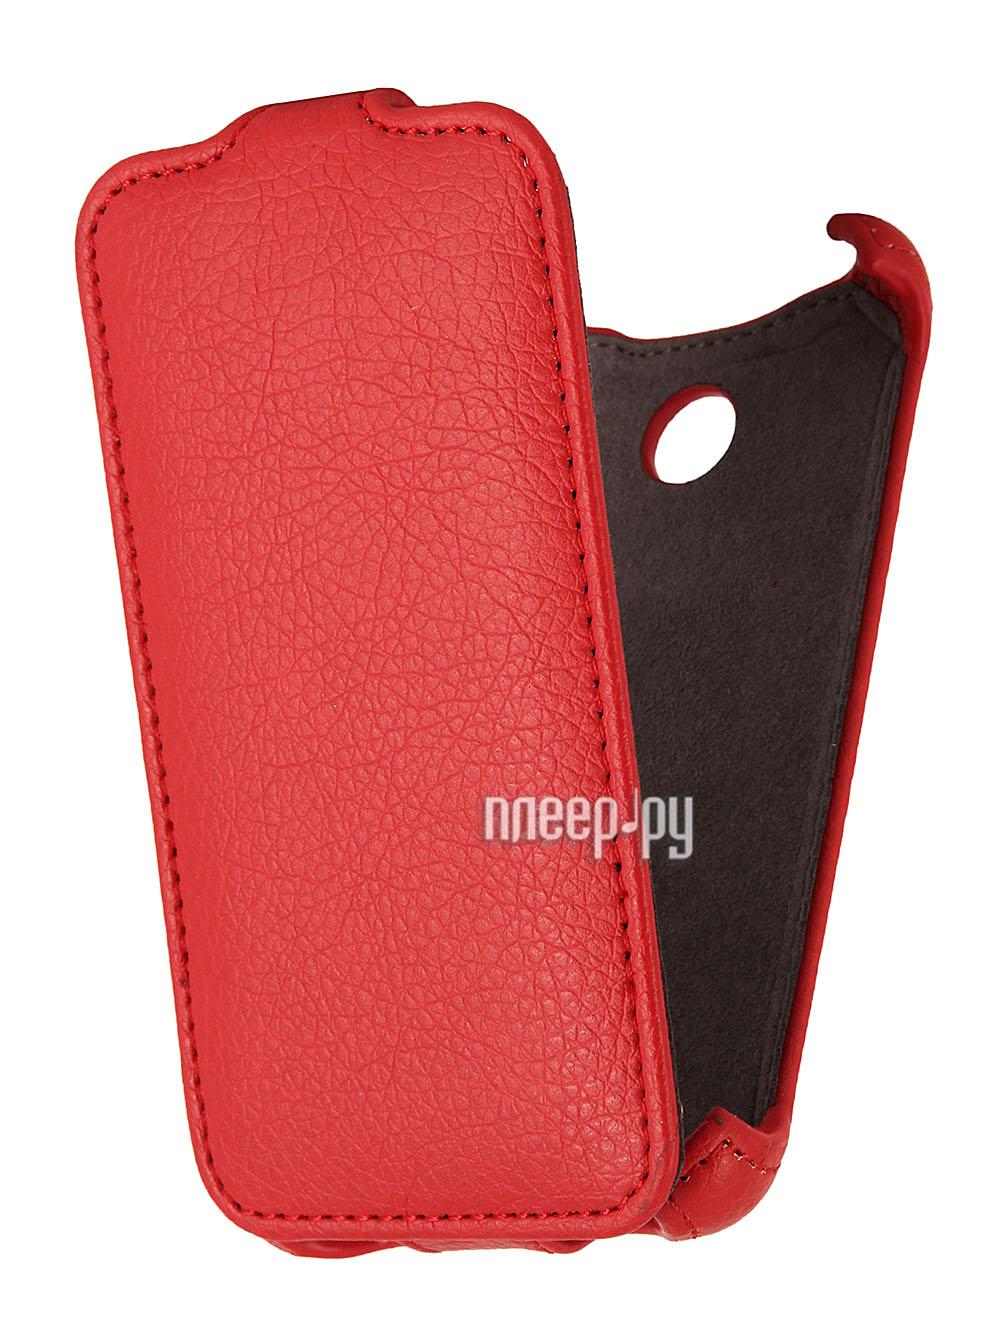 Аксессуар Чехол Sony Xperia E1 Dual Gecko Red  Pleer.ru  998.000